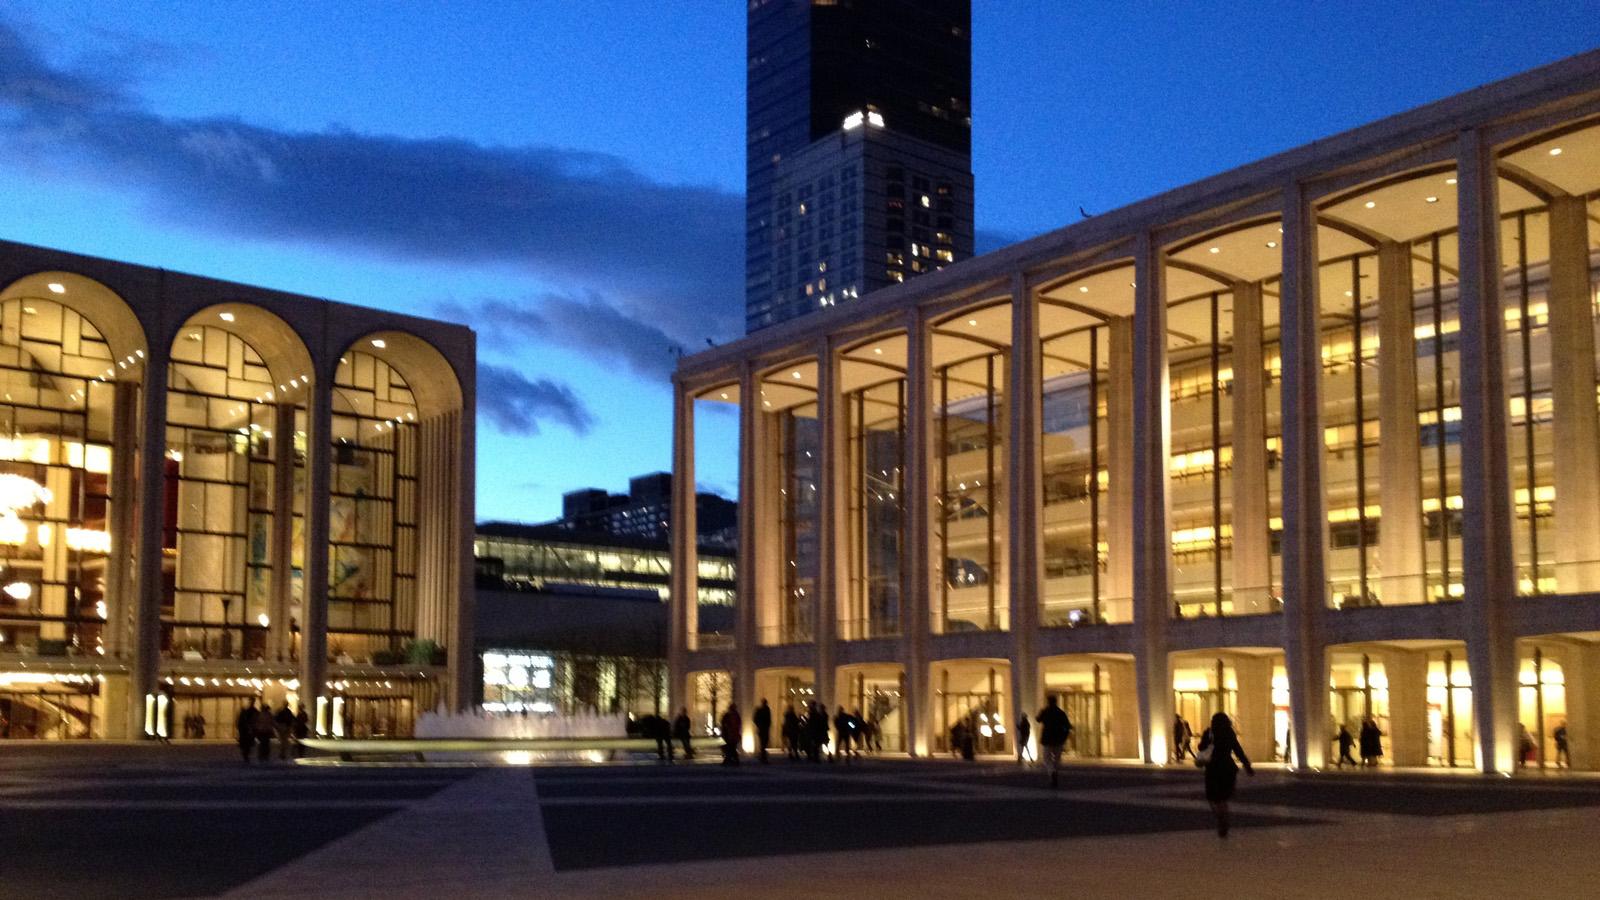 NY_NYC_LincolnCenter_signature_02_EduardKrakhmalnikov_2012.jpg